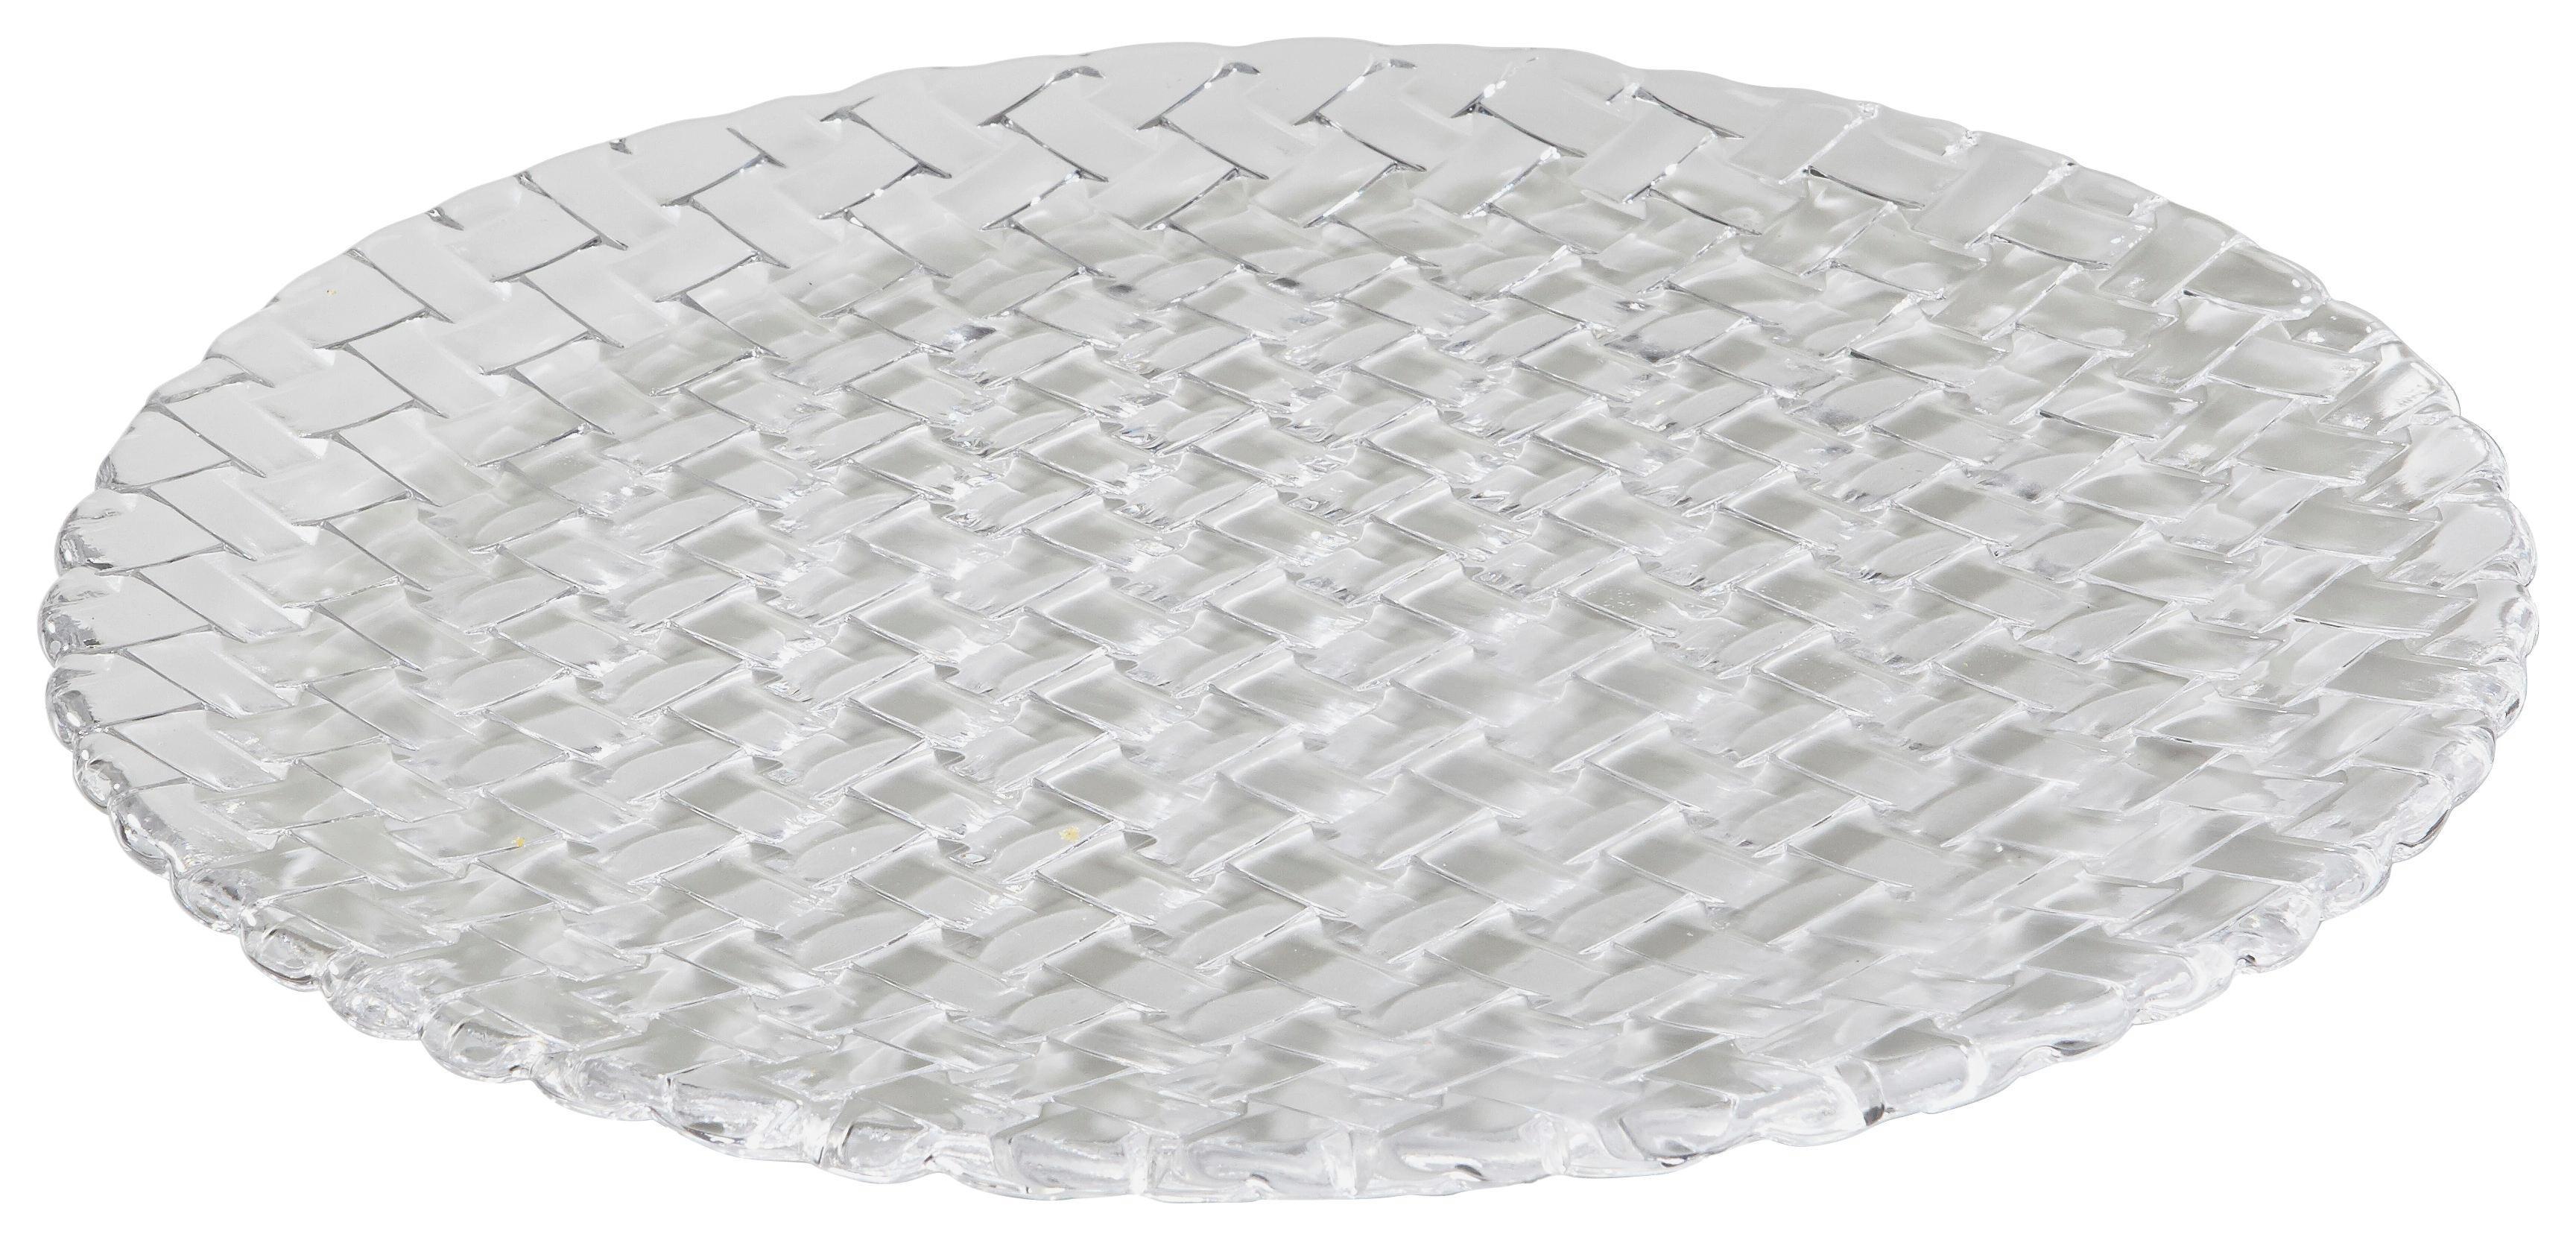 Platzteller-Set Glas 2-teilig - Klar, Glas (32.0cm) - NACHTMANN